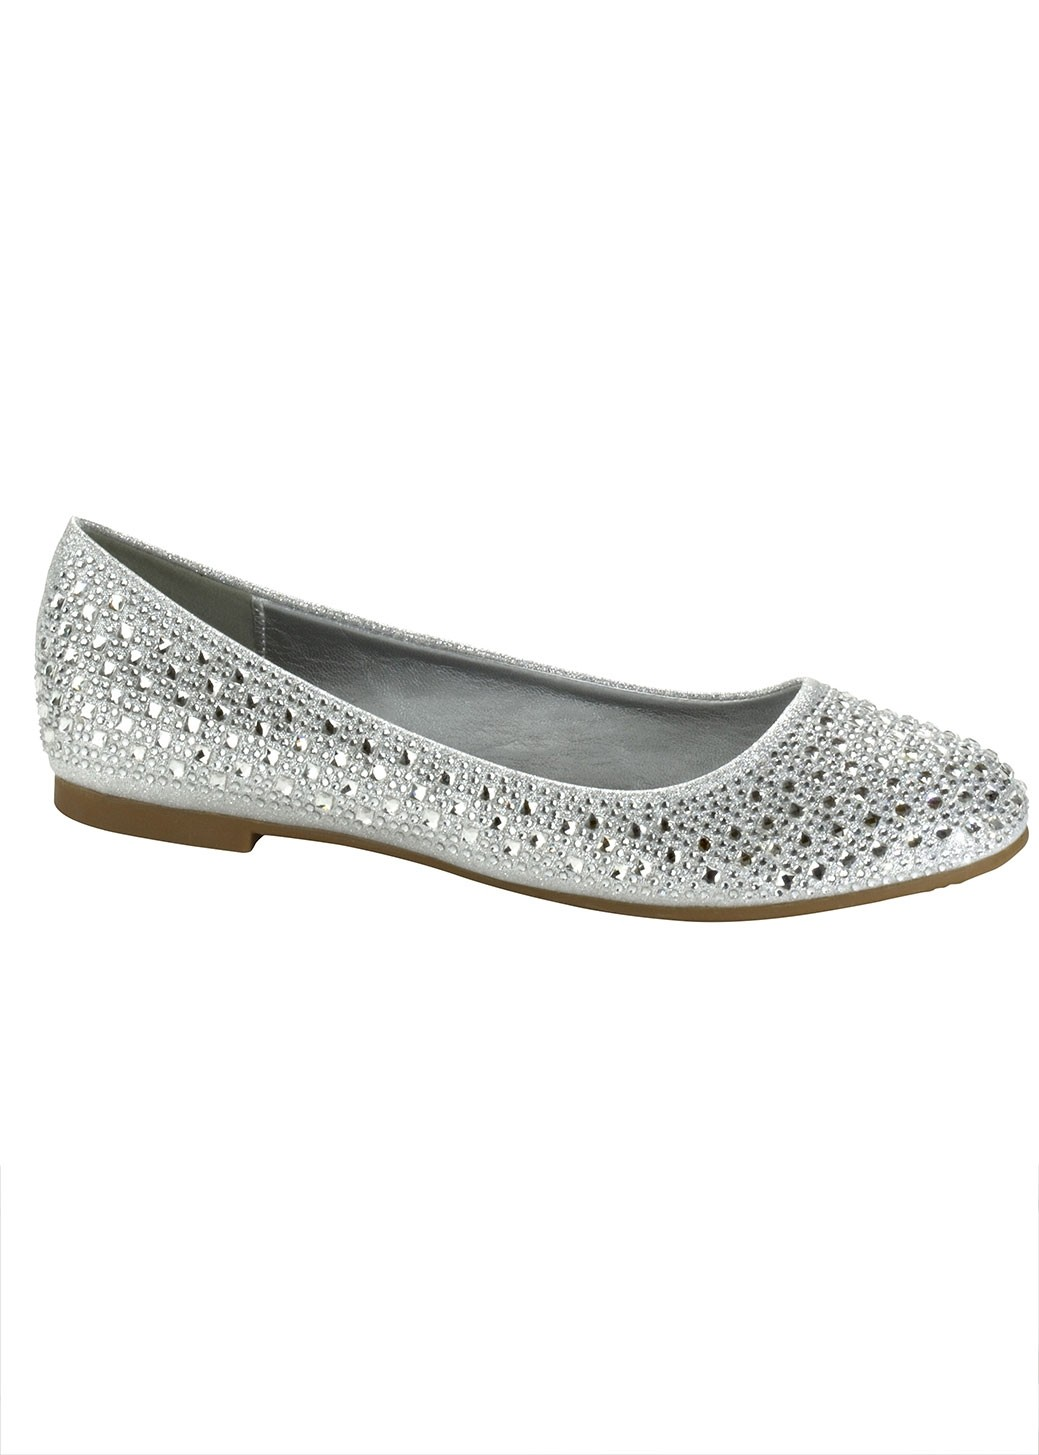 Silver Shimmer Flats